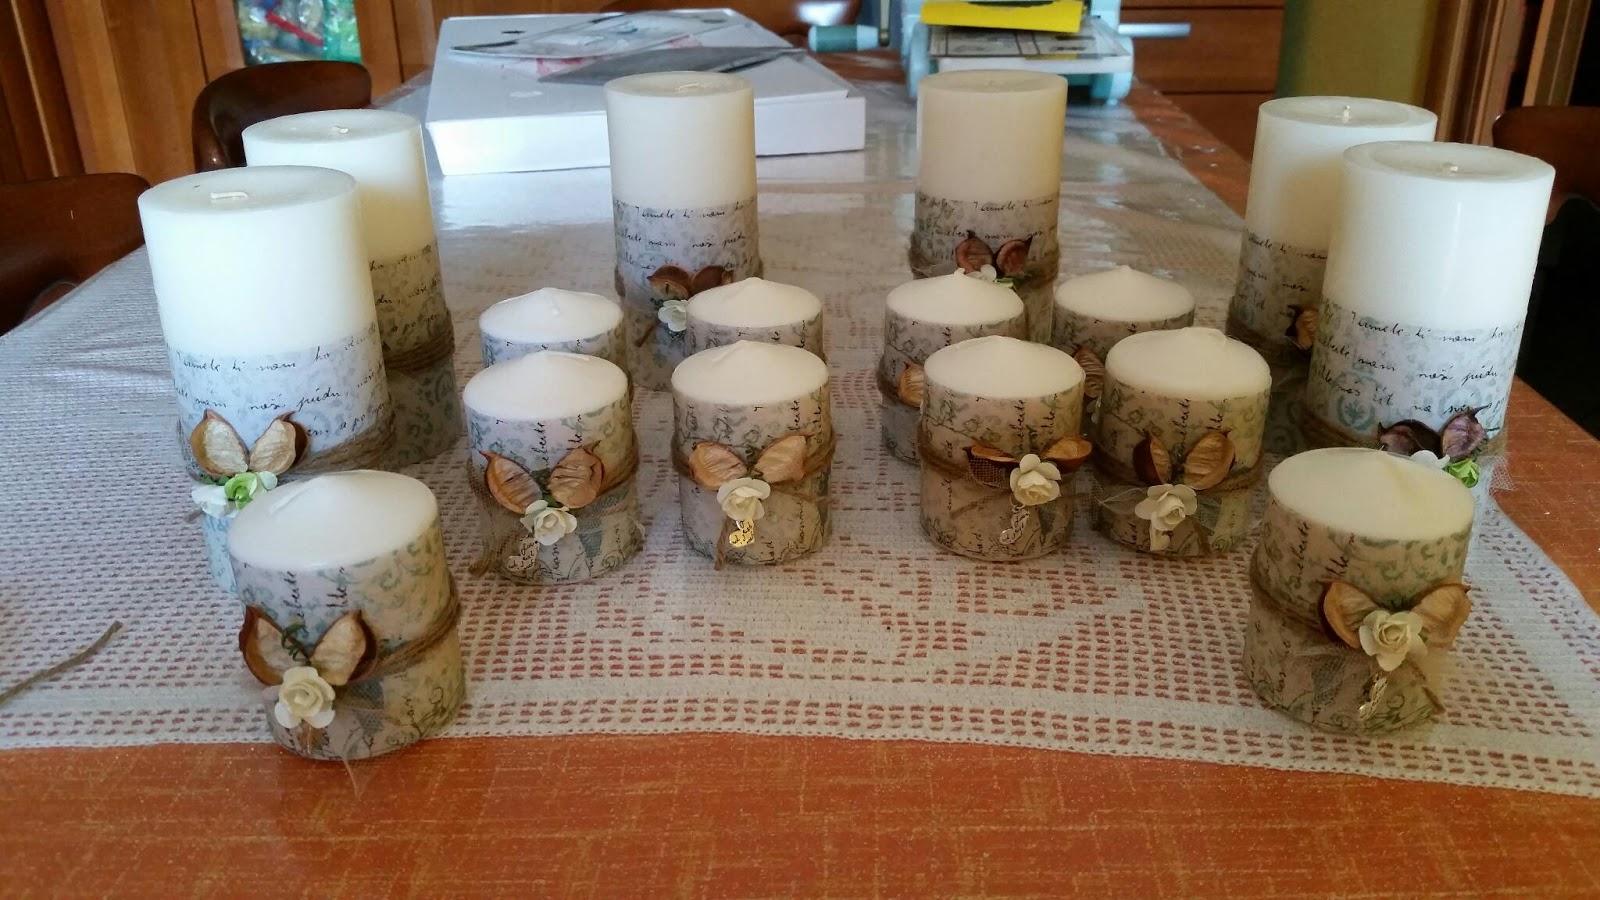 Creativa felice candele e carta combinata vincente - Decorare casa con candele ...